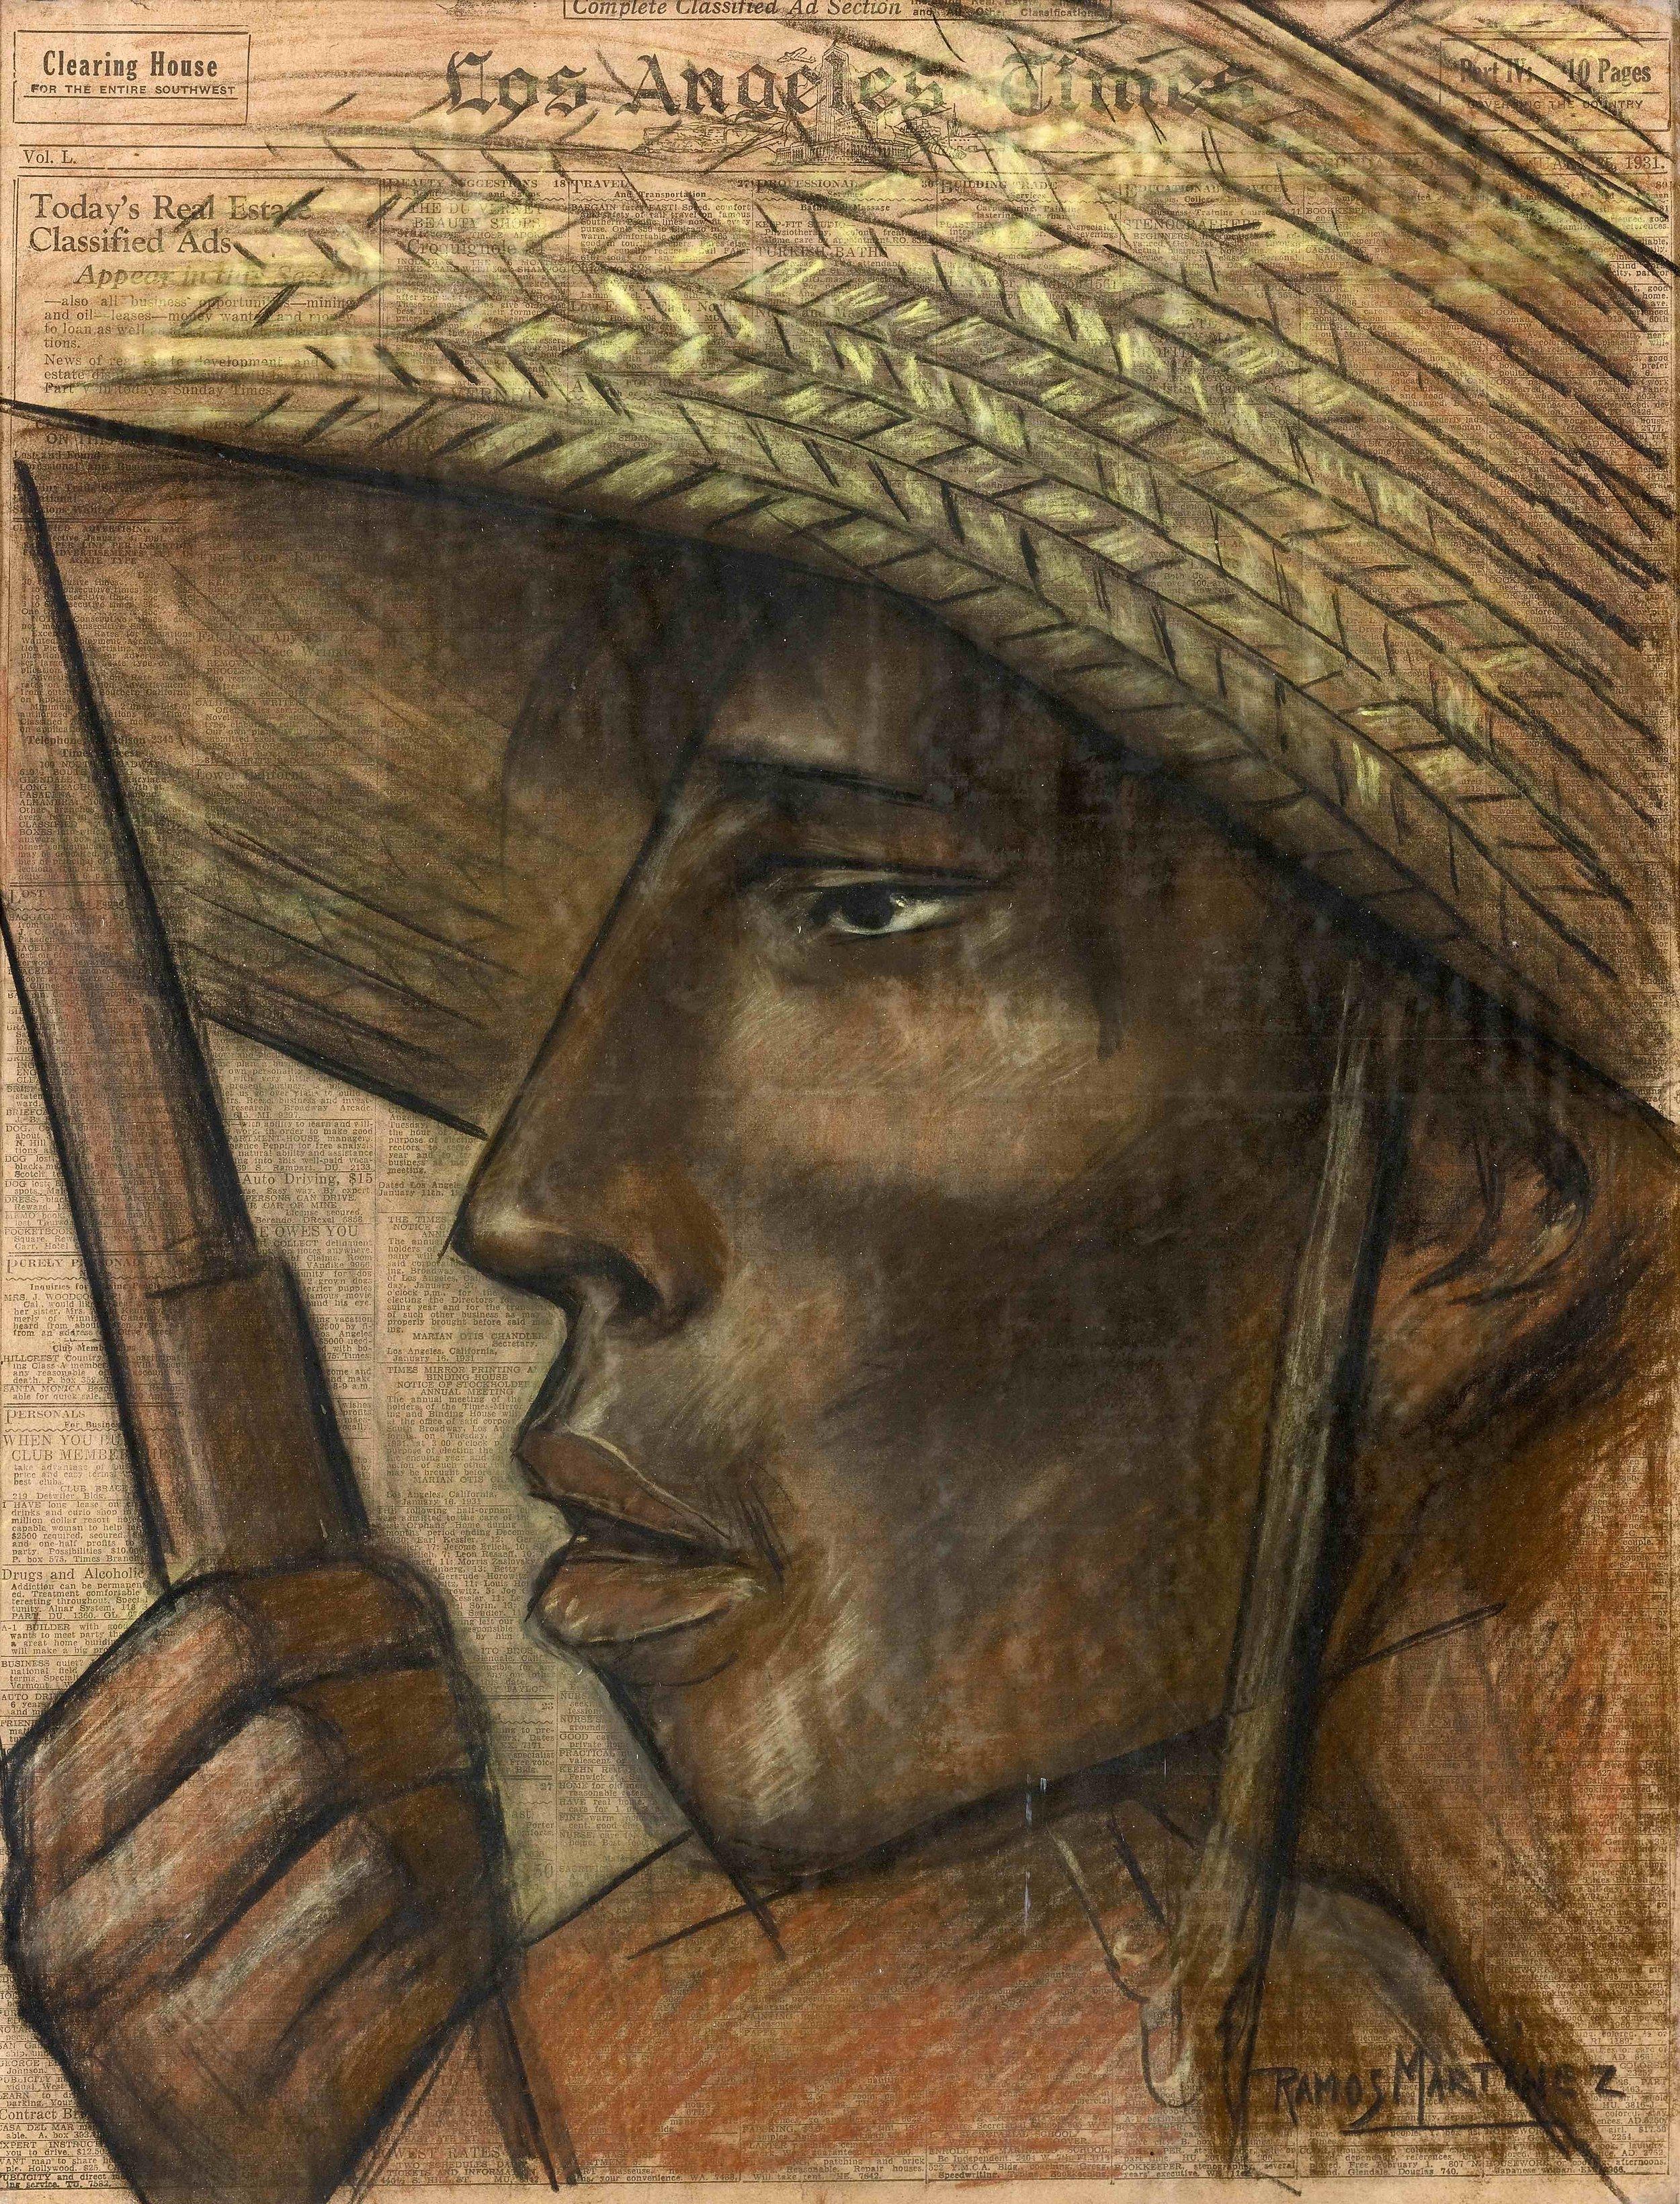 Cabeza de Campesino / Head of a Peasant  1931 charcoal and Conté crayon on newsprint / carbón y crayon Conté sobre papel periódico ( Los Angeles Times , January 25, 1931) 21.9 x 16.6 inches; 55.6 x 42.2 centímetros Private collection